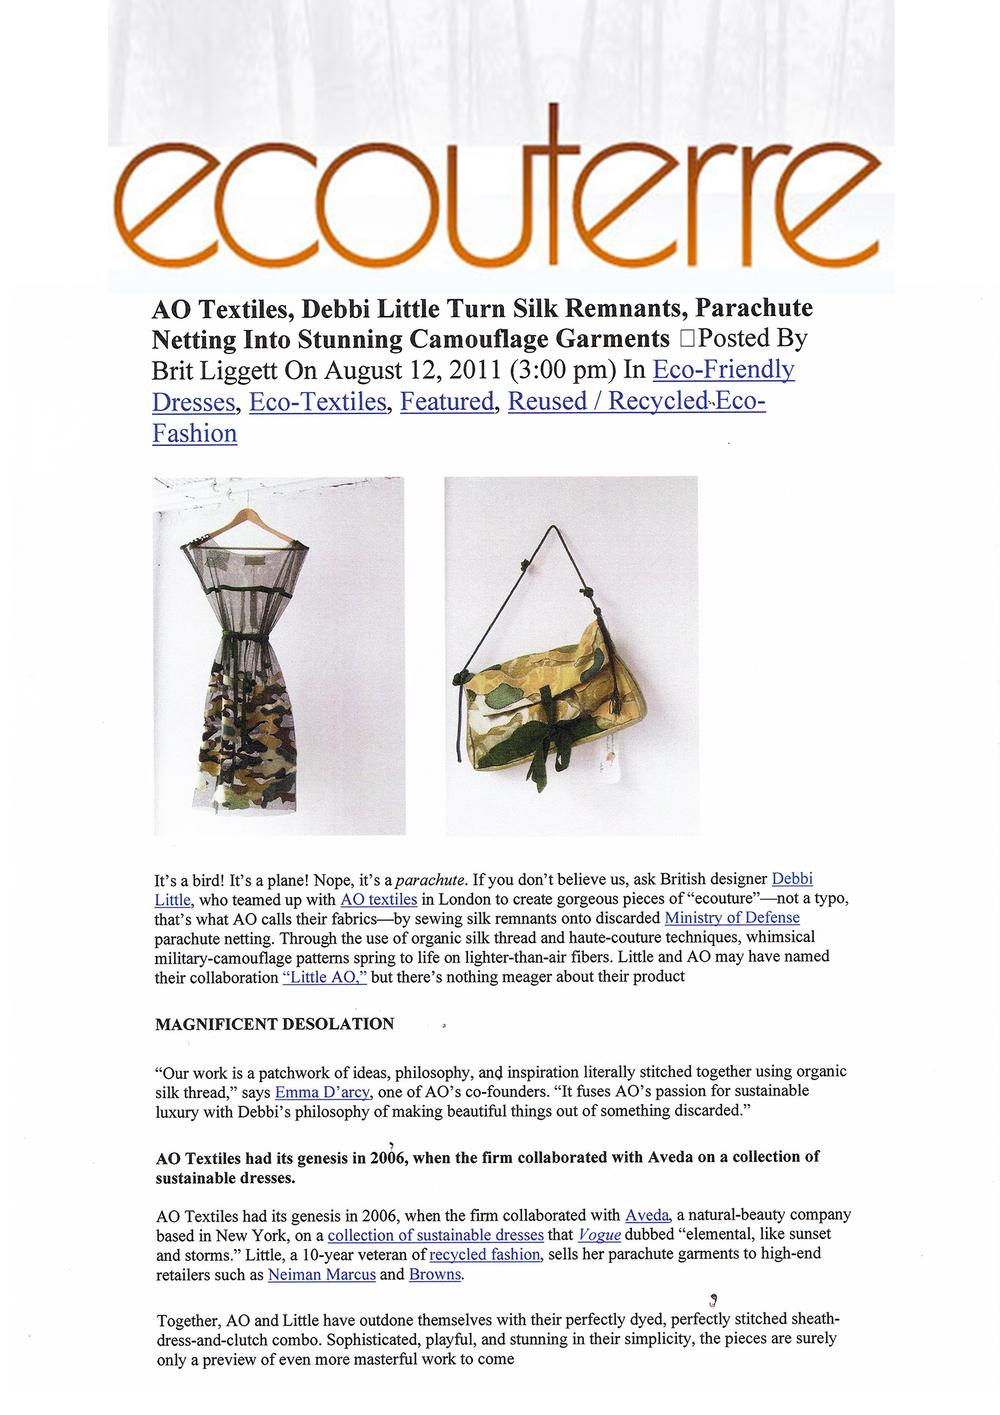 ecouterre2-press web ready.jpg